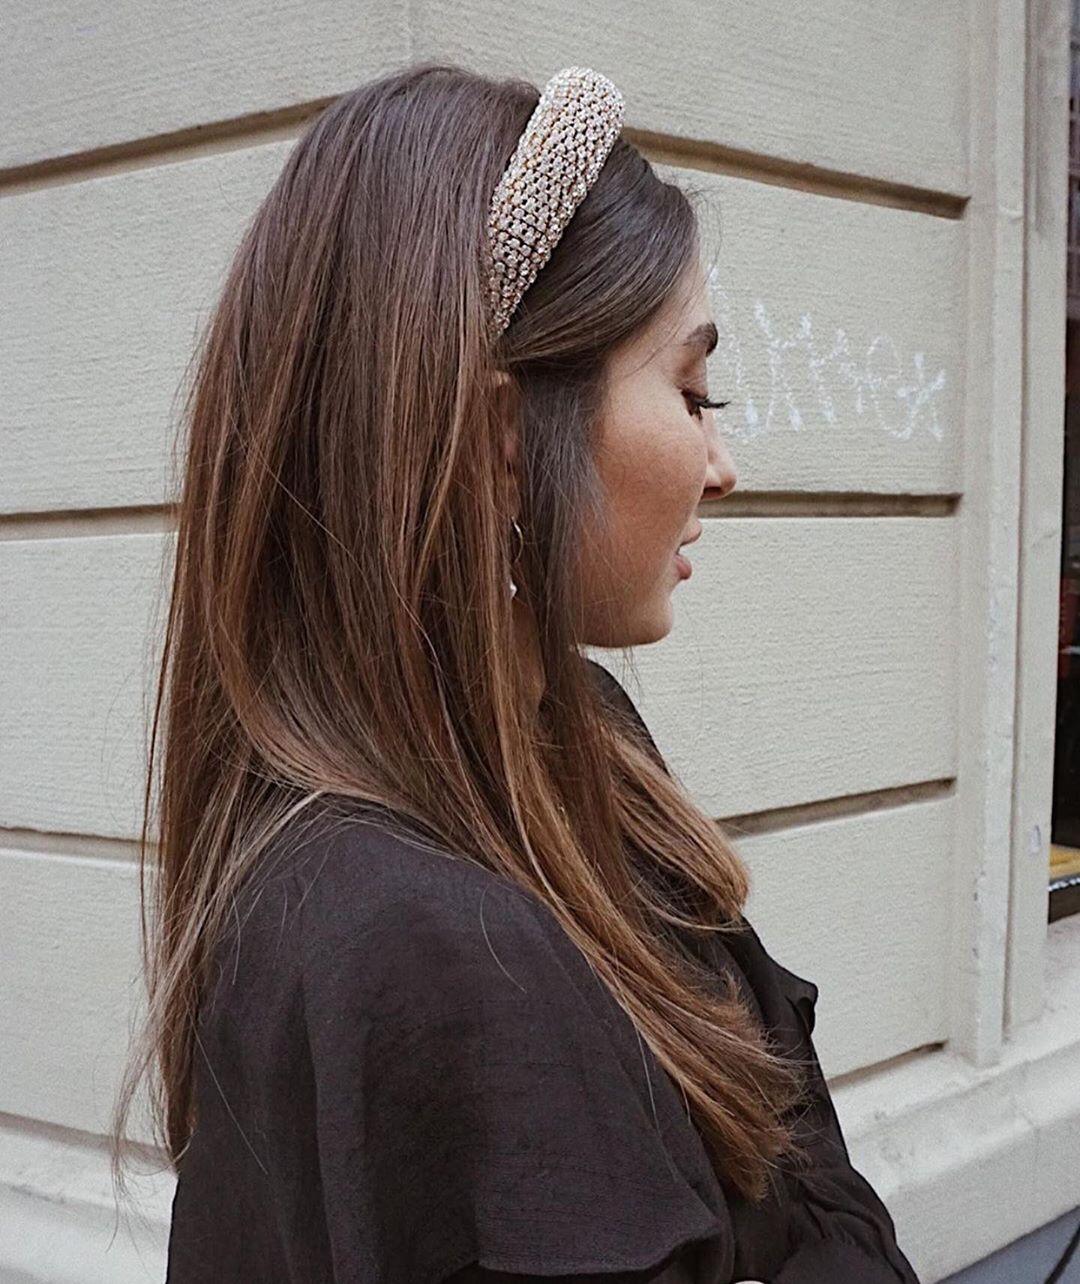 padded headband with rhinestones de Zara sur zaraaddiction